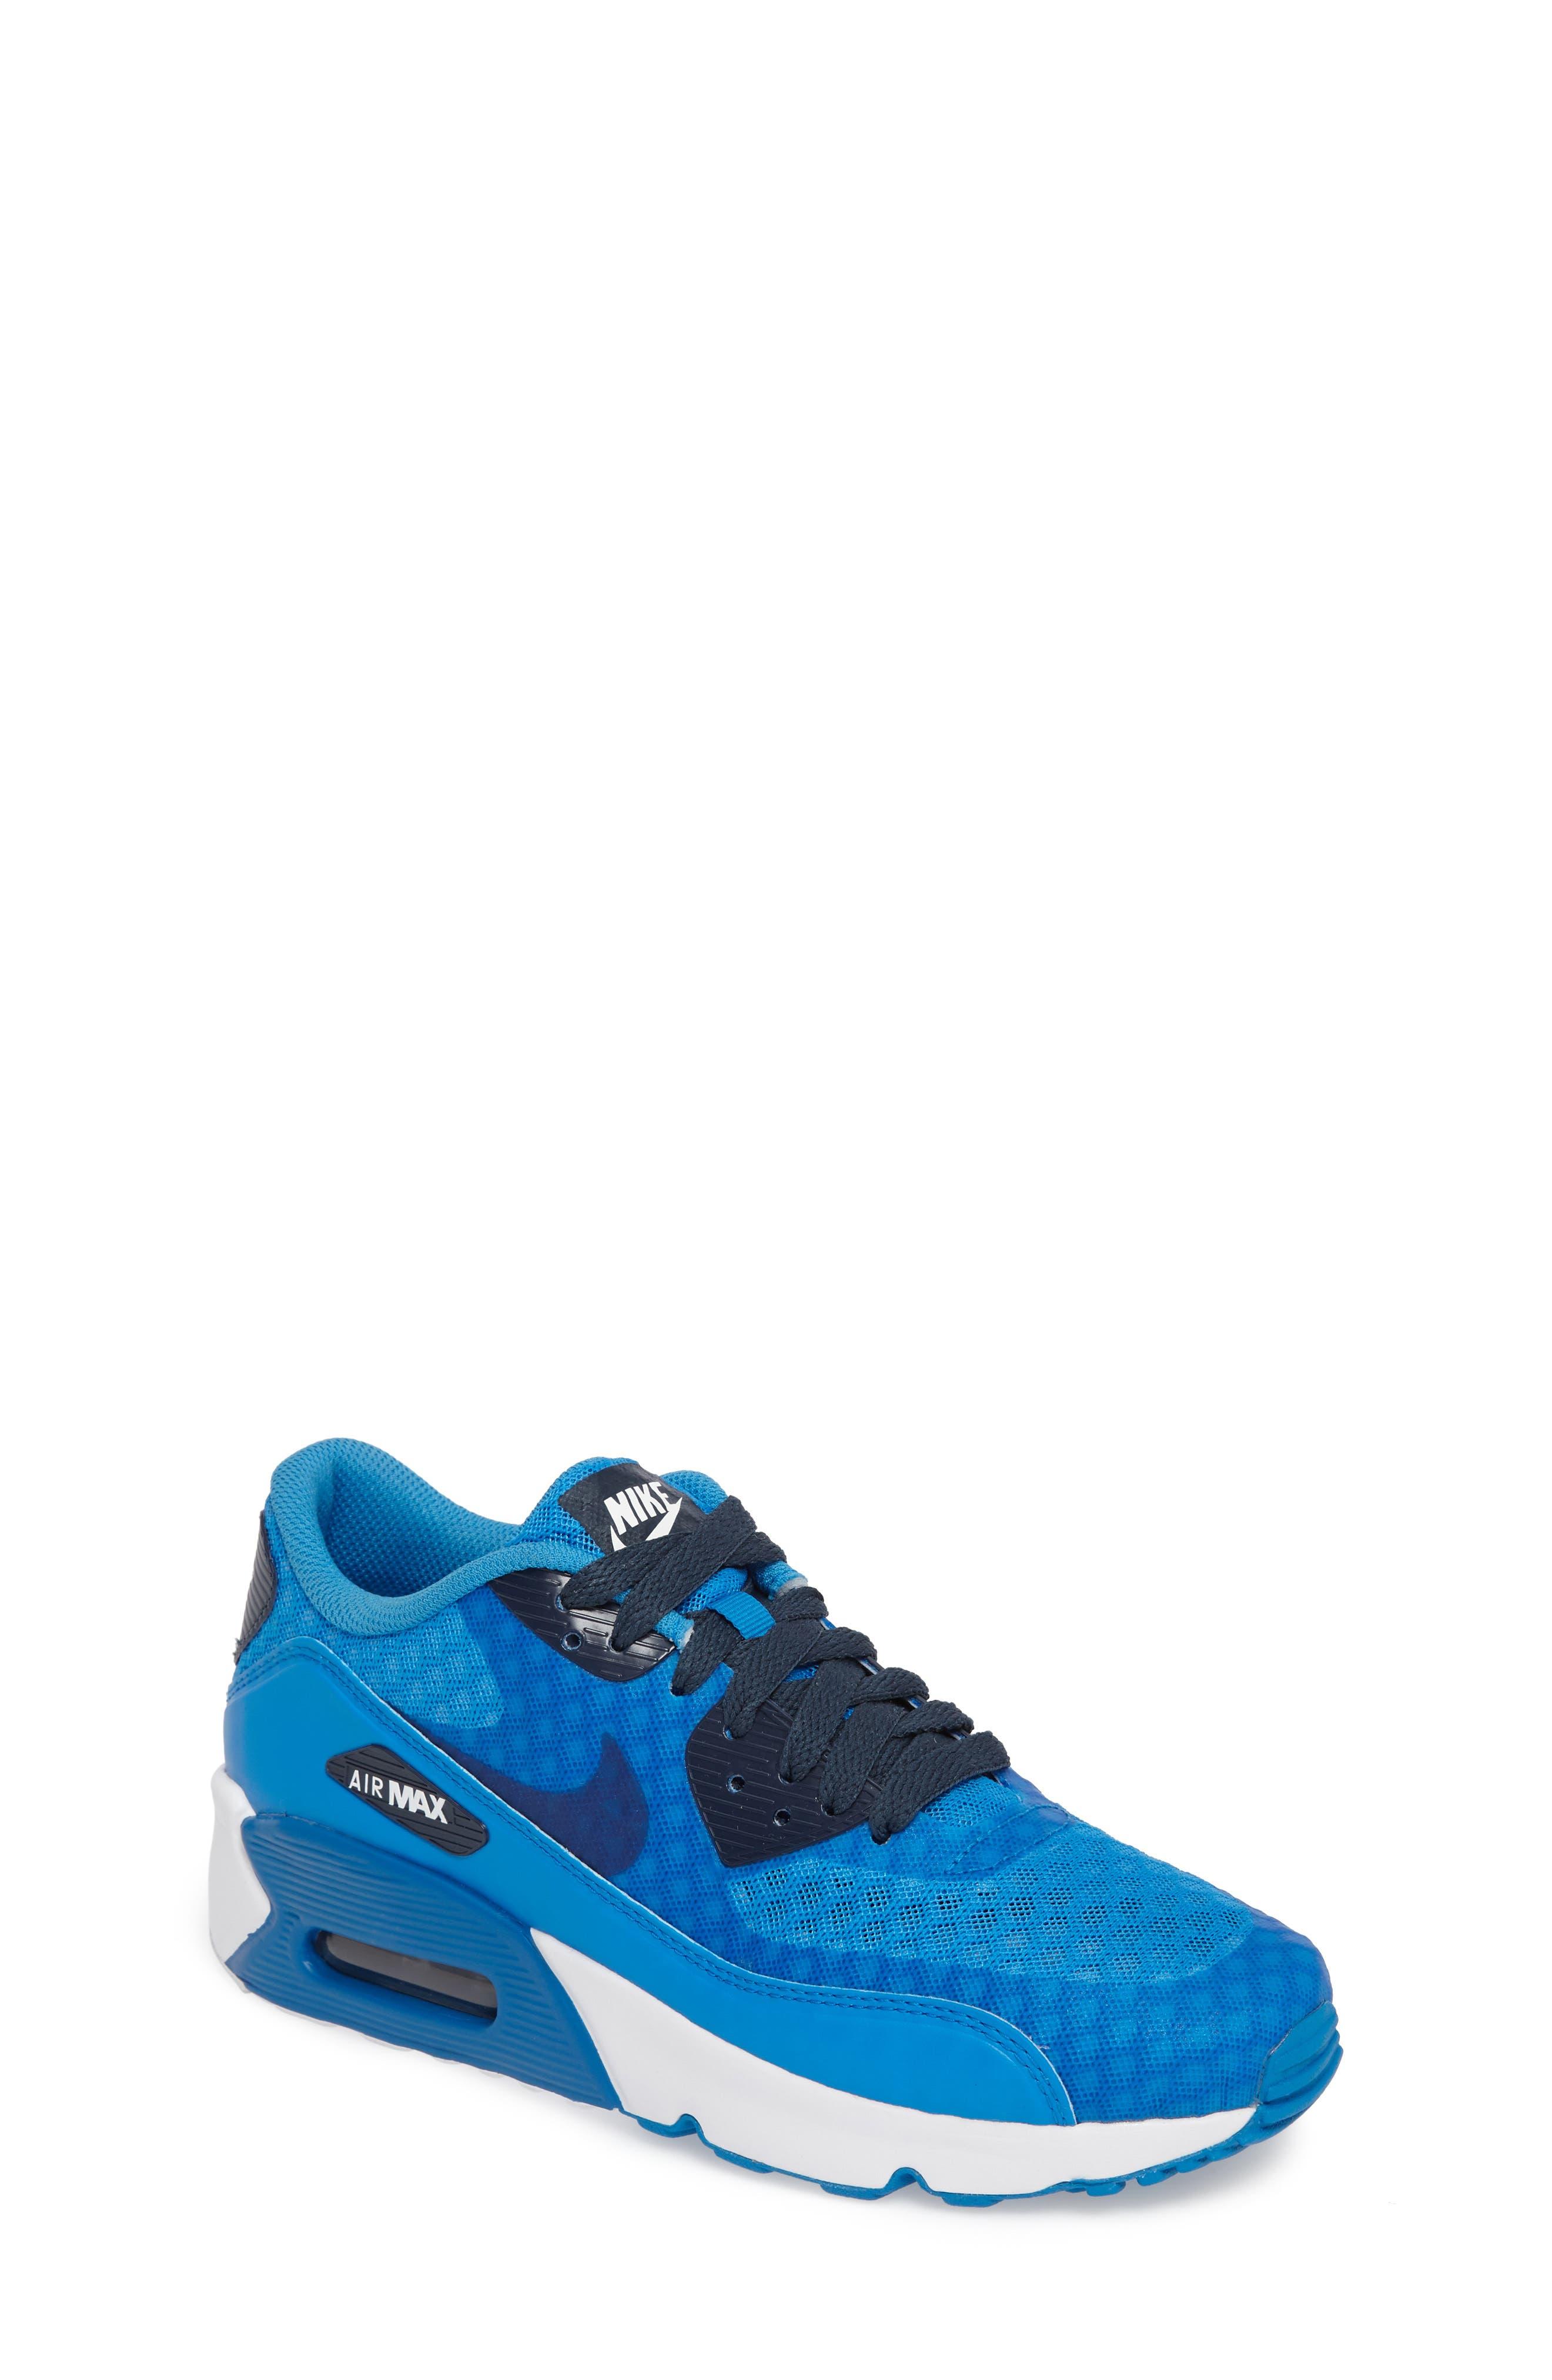 NIKE Air Max 90 Ultra 2.0 Breathe Sneaker